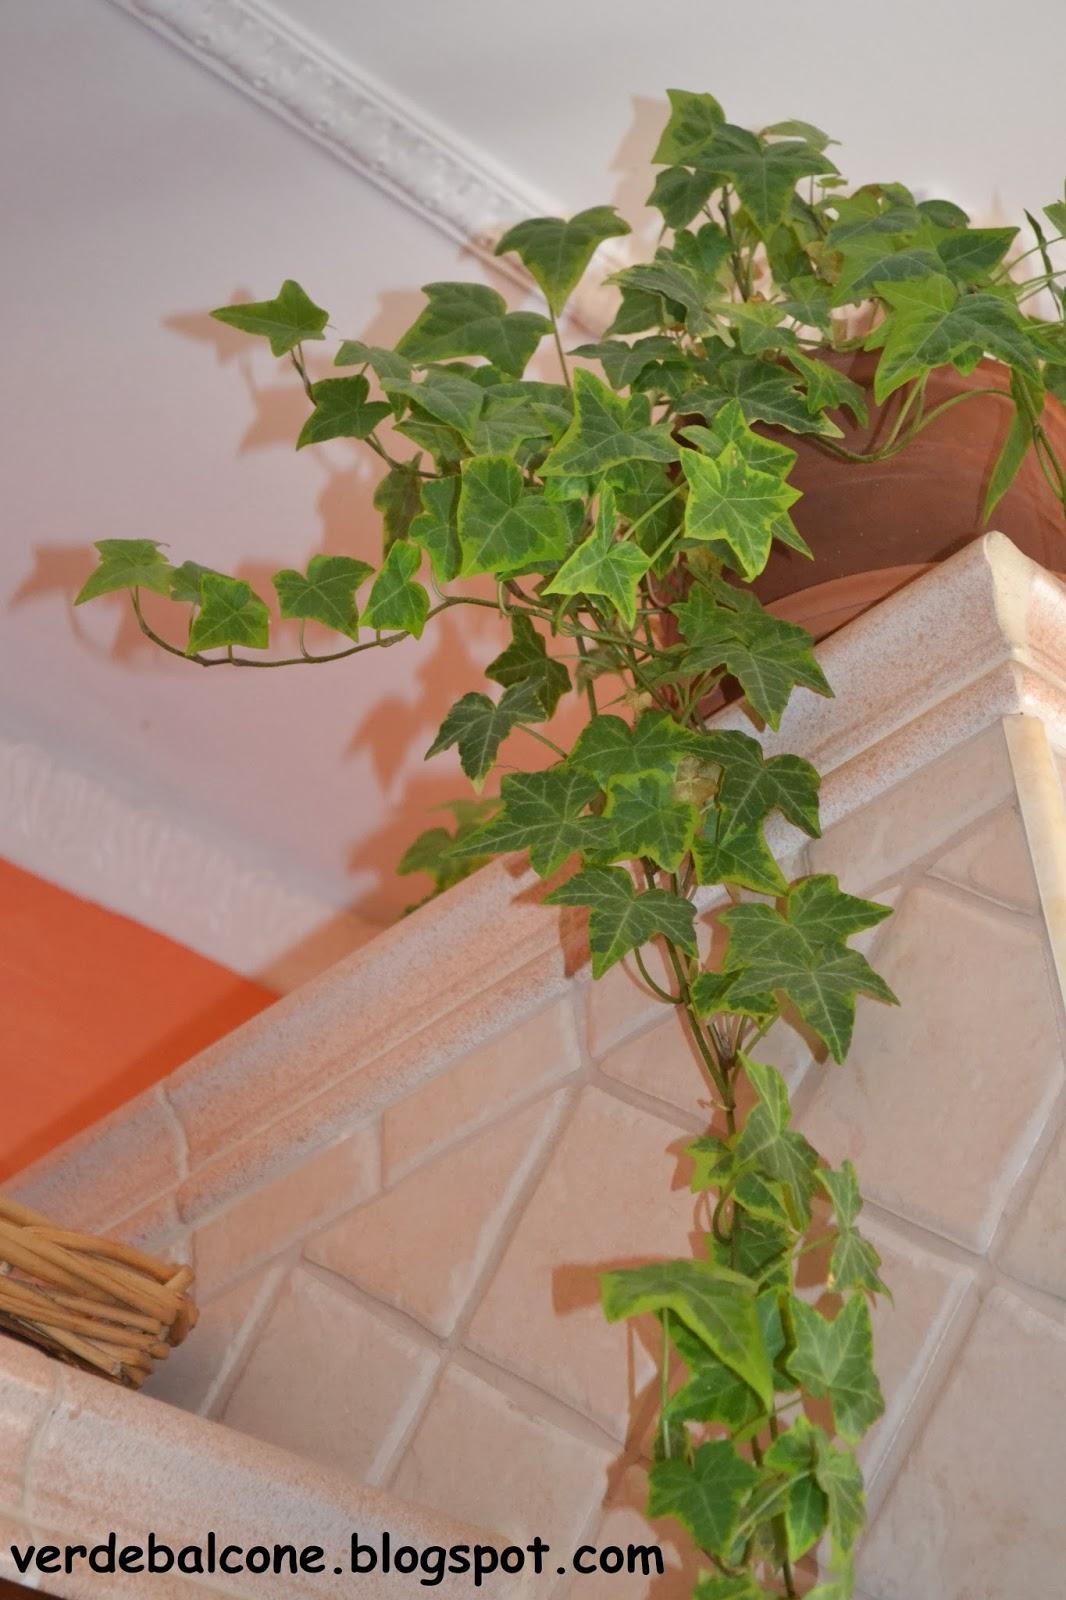 Edera Pianta Da Interno verde balcone.: edera, regina degli interni.